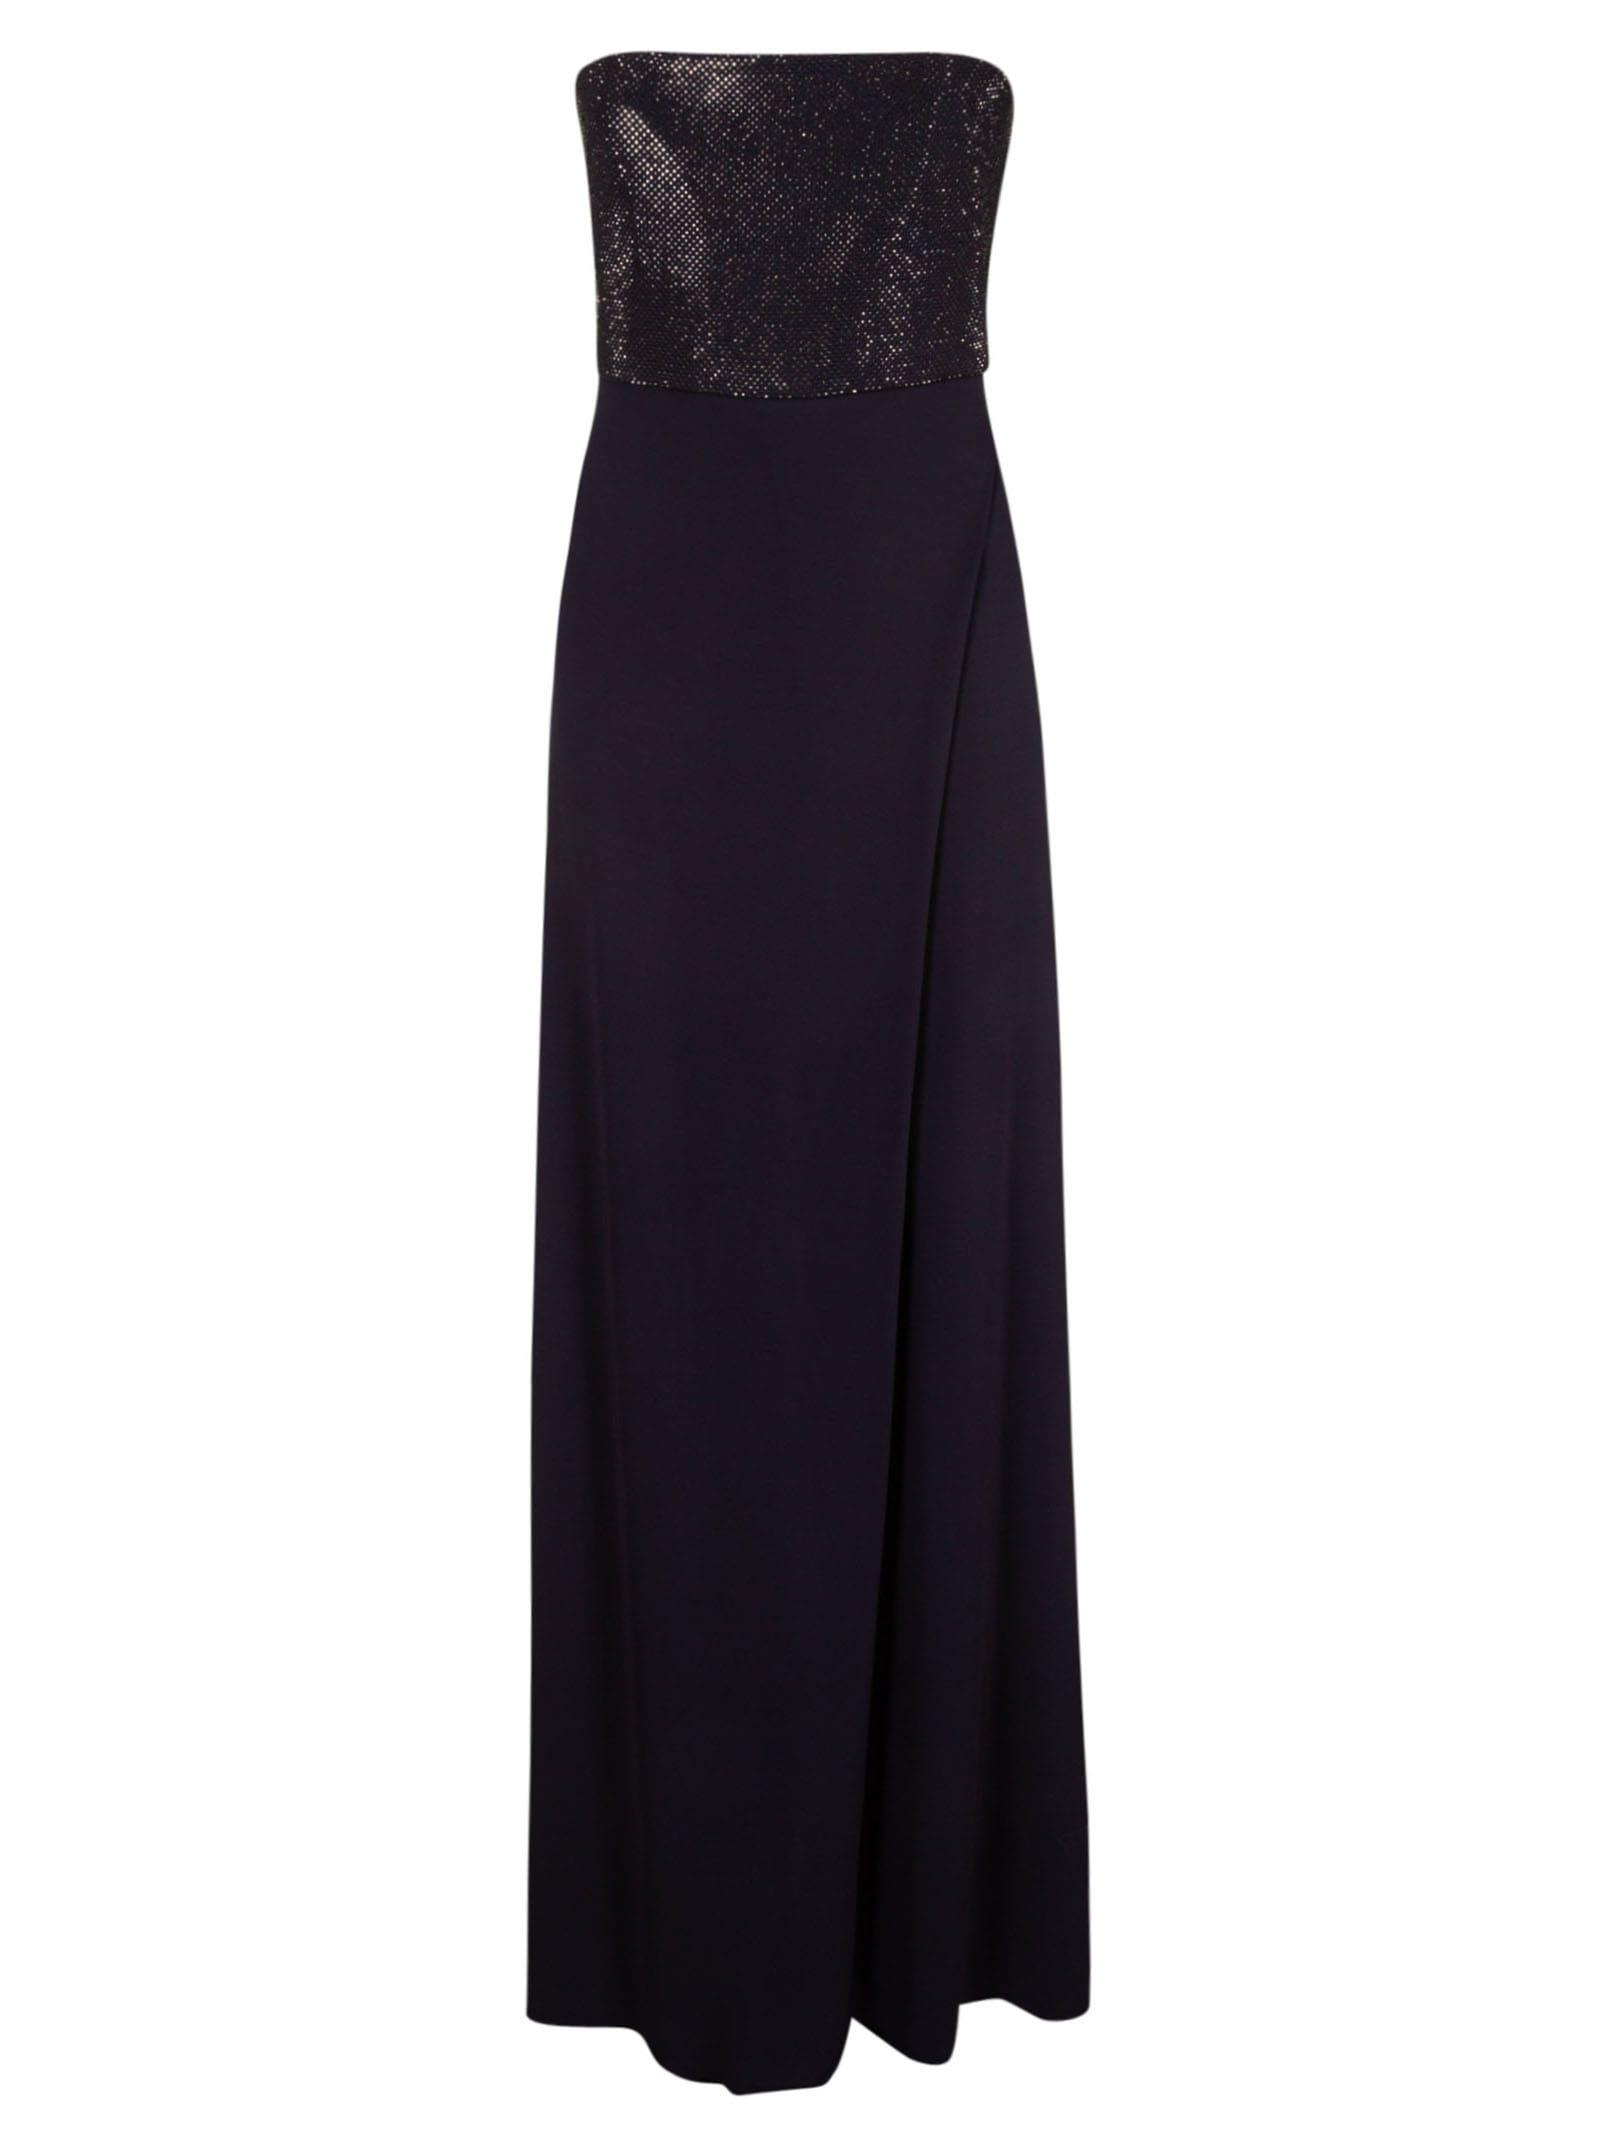 Buy Emporio Armani Back Long Zip Dress online, shop Emporio Armani with free shipping